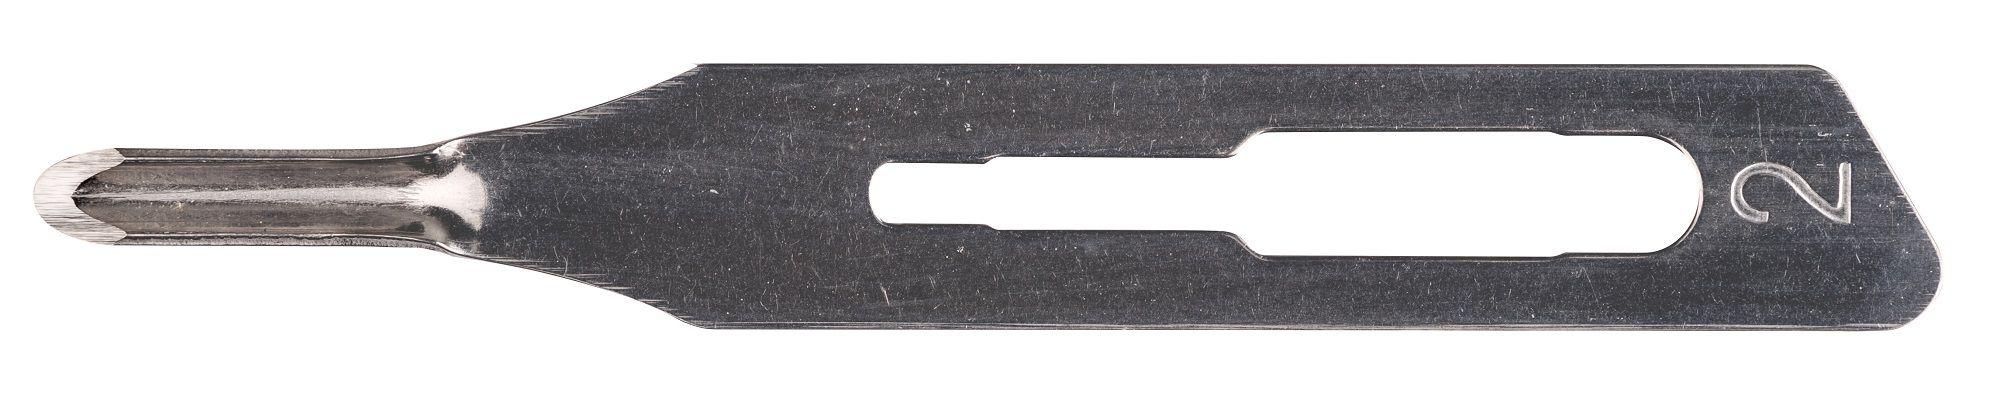 Lâmina de Goiva/Gubia CZ MBI N° 02 (50 Unidades) - Frete Grátis